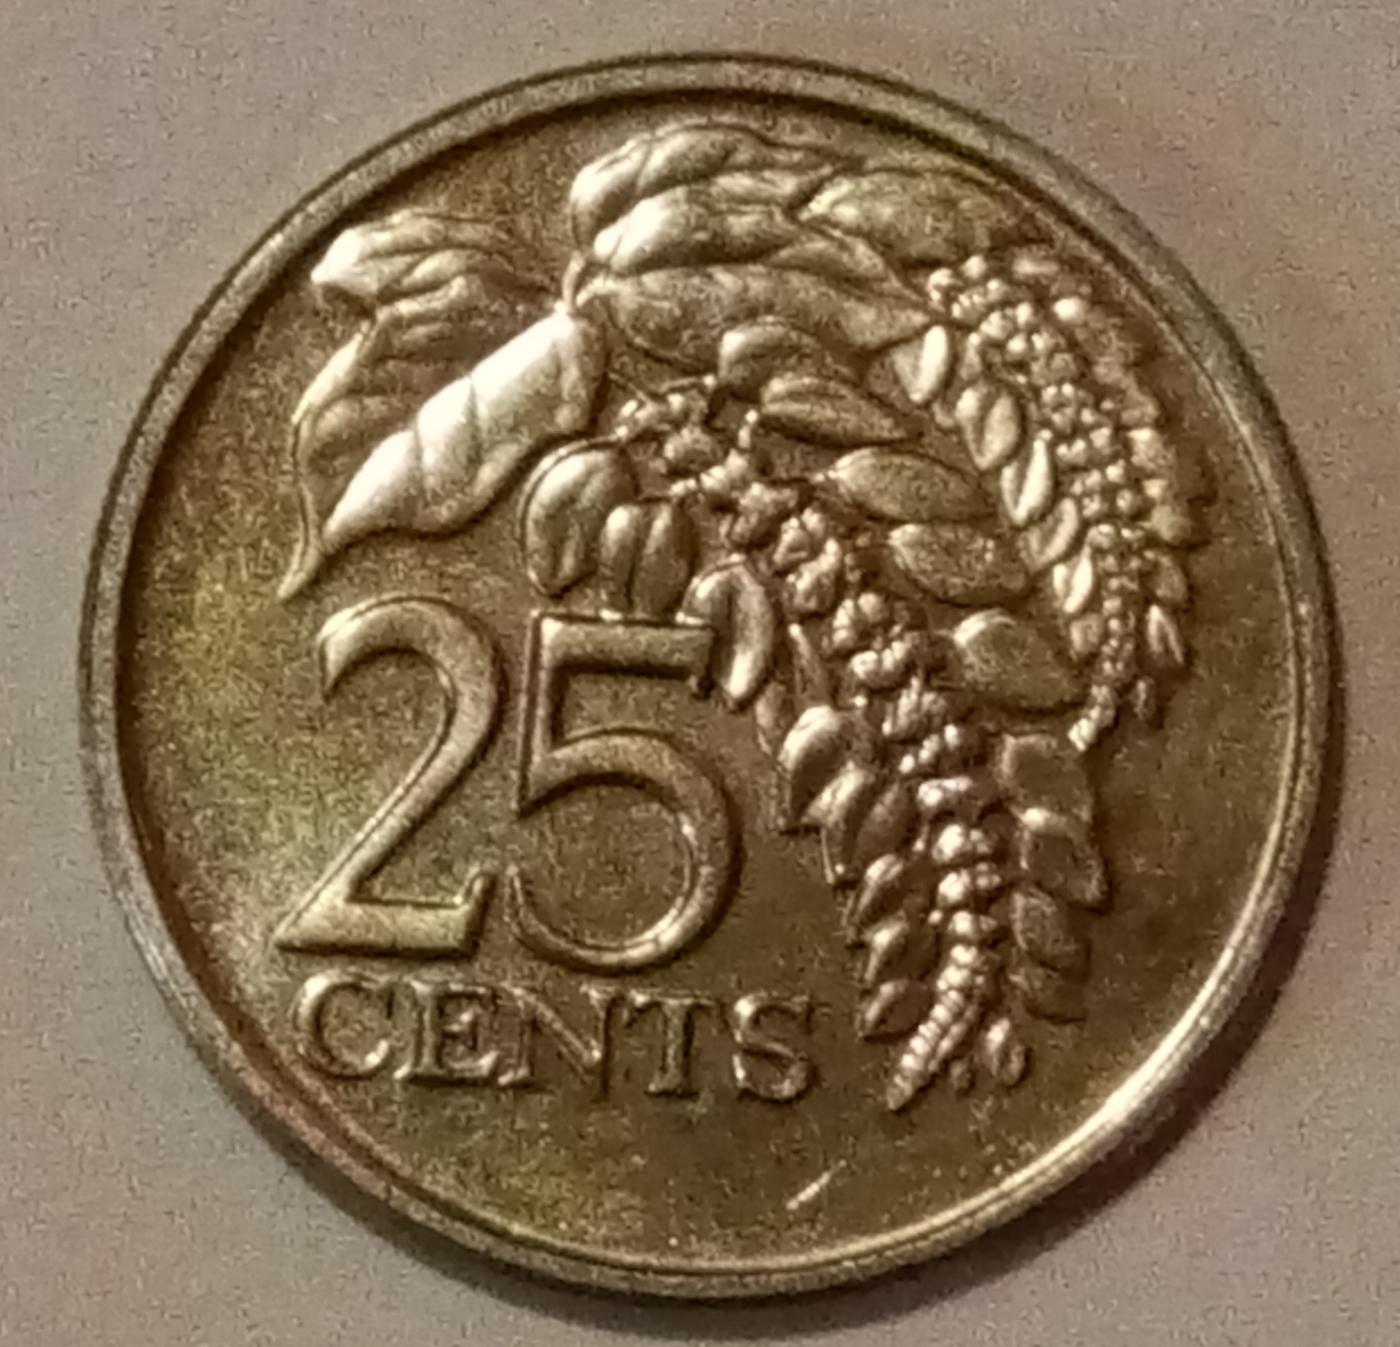 Coin Sets of All Nations Trinidad /& Tobago 1978-1994 UNC $1 1979 50 cents 1978